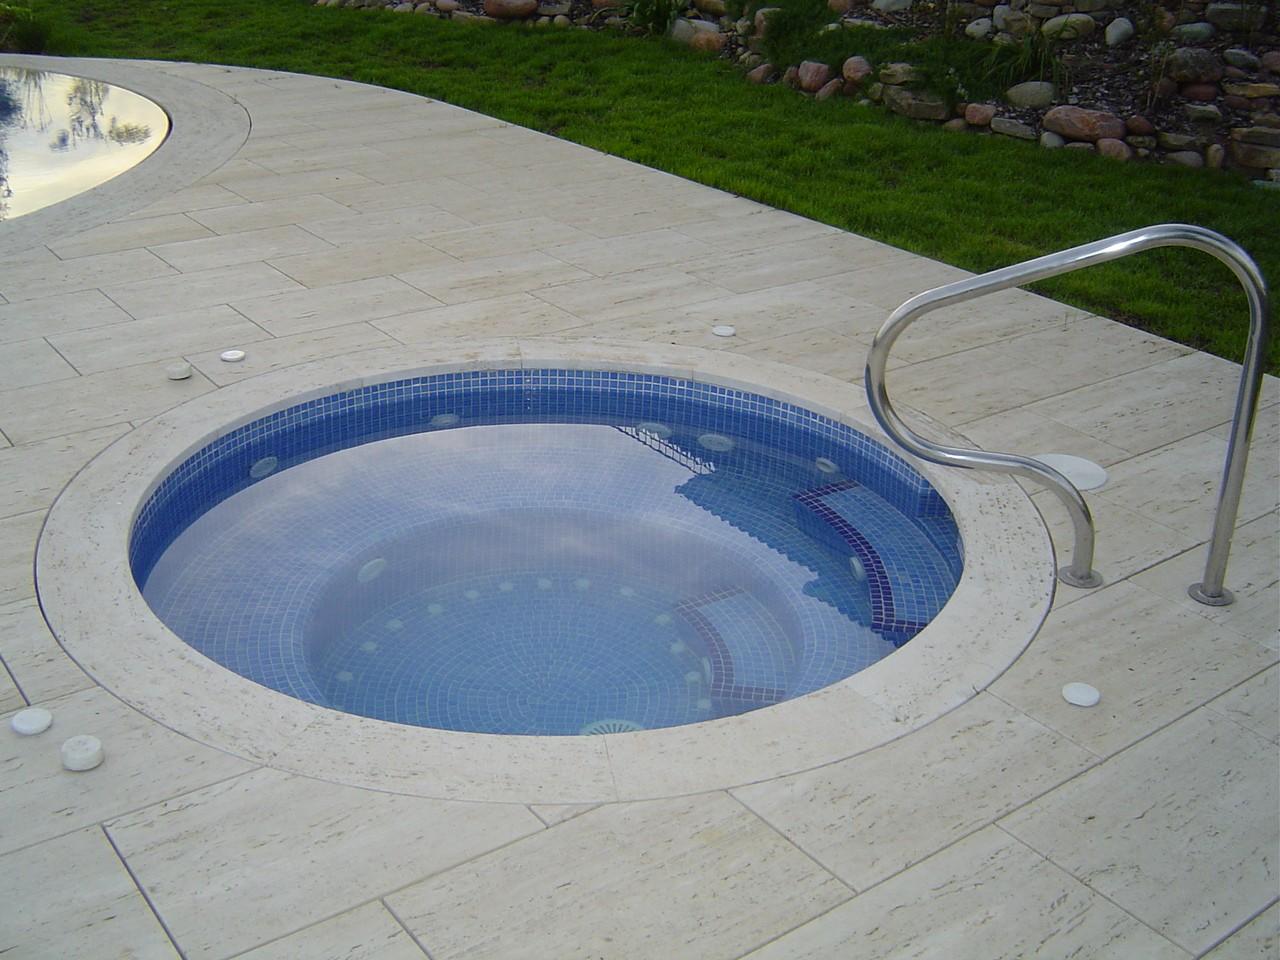 Piscina unifamiliar con jacuzzi construcci n de piscinas - Construccion de piscinas precios ...